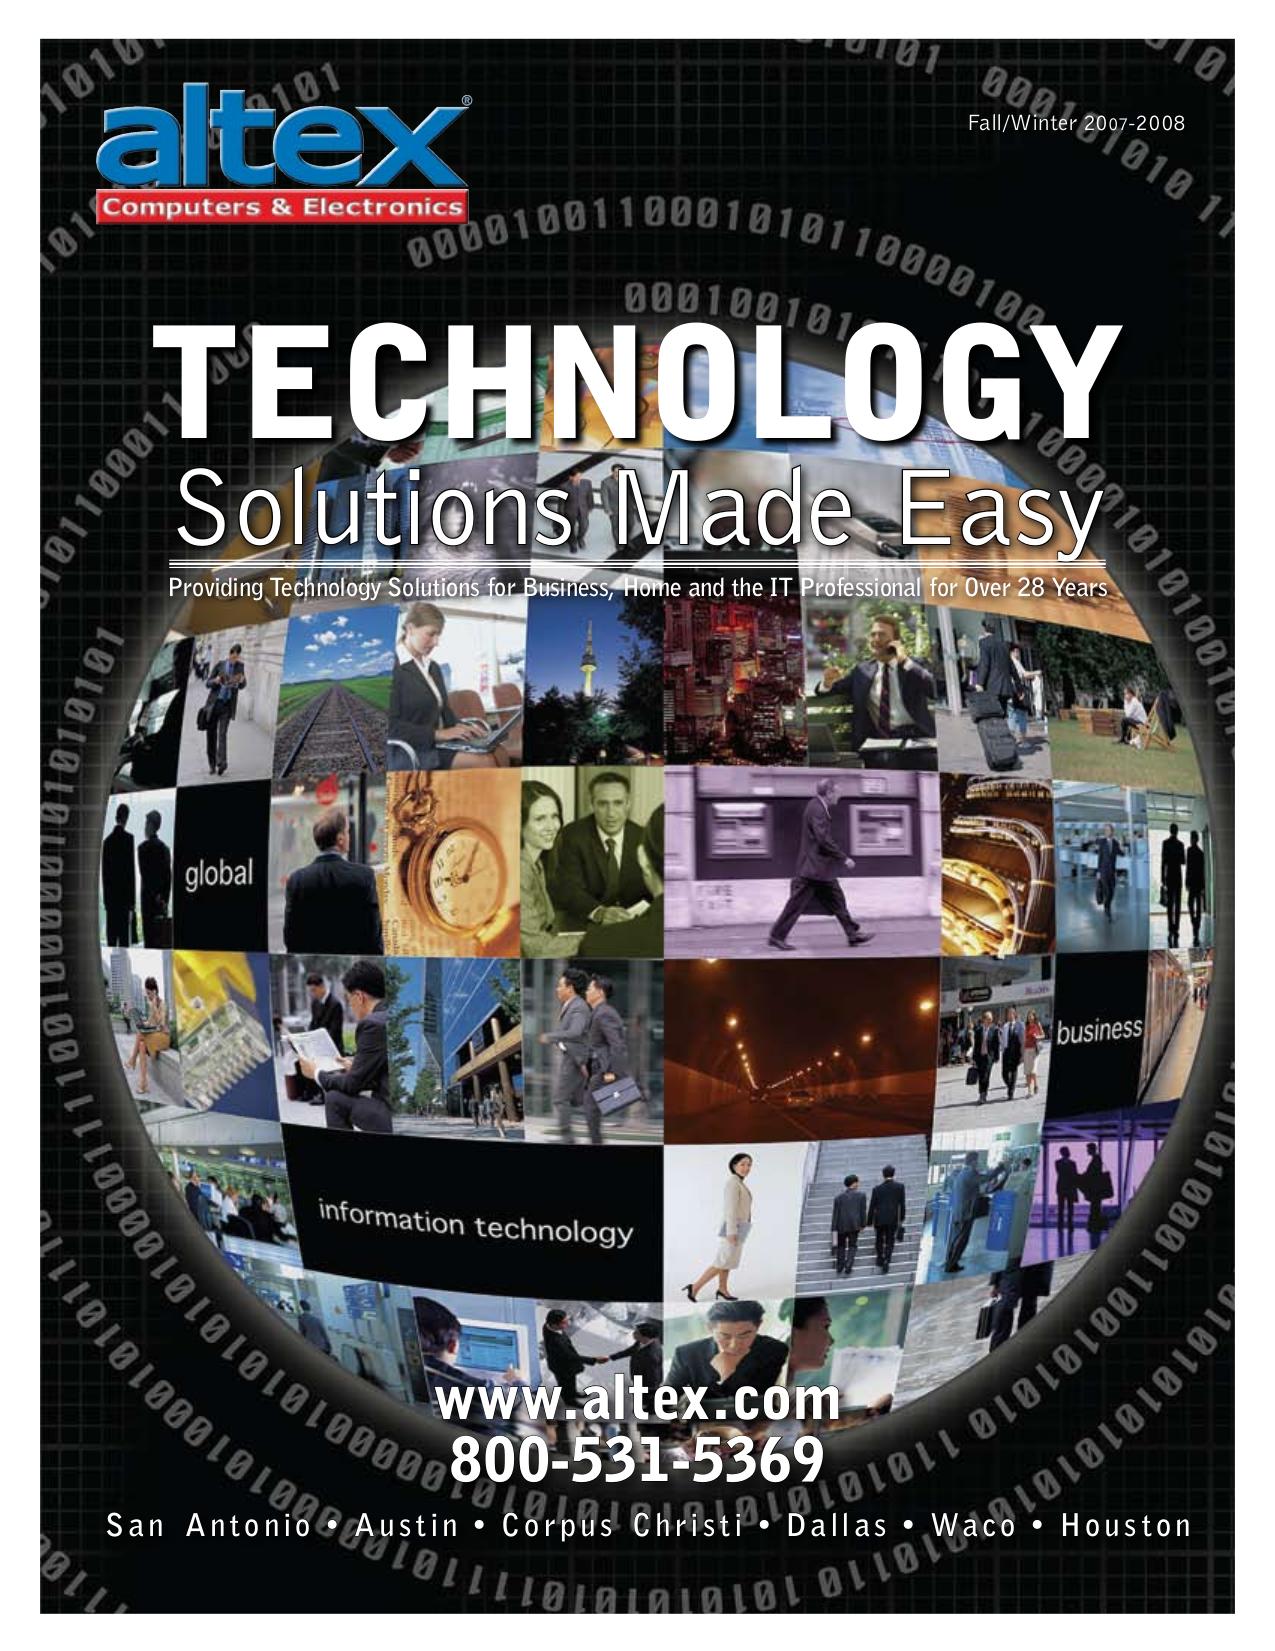 cctv tutorial pdf download free